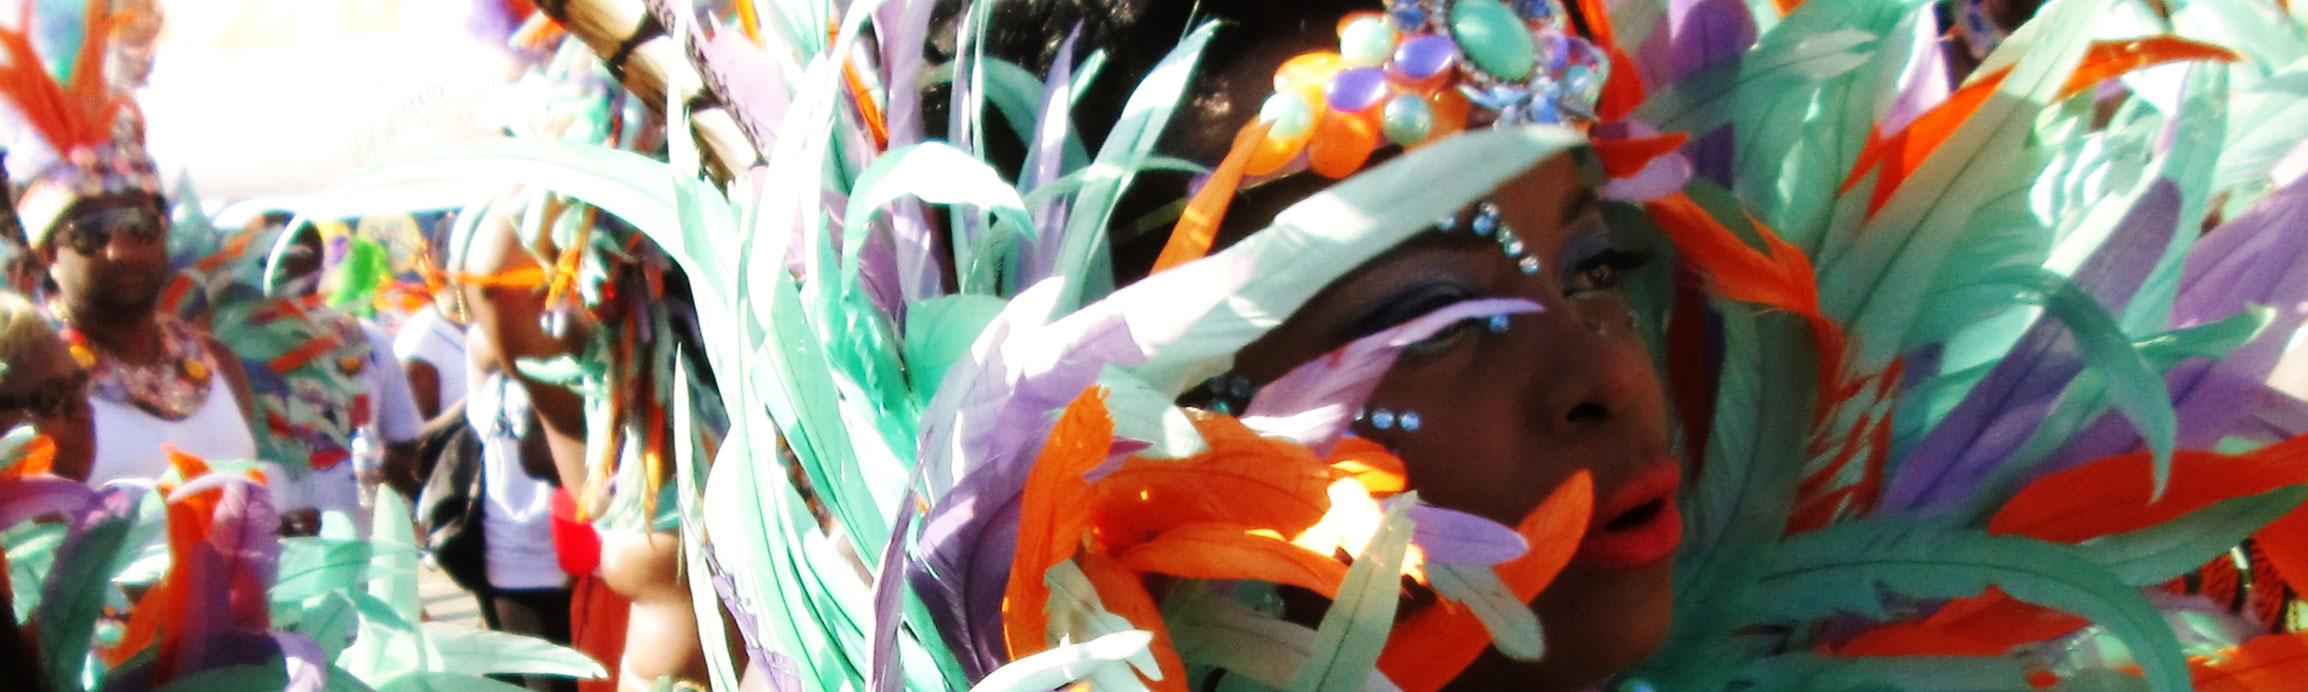 NISHLA-Design_Trinidad-Carnival_woman-IMG_2152.jpg